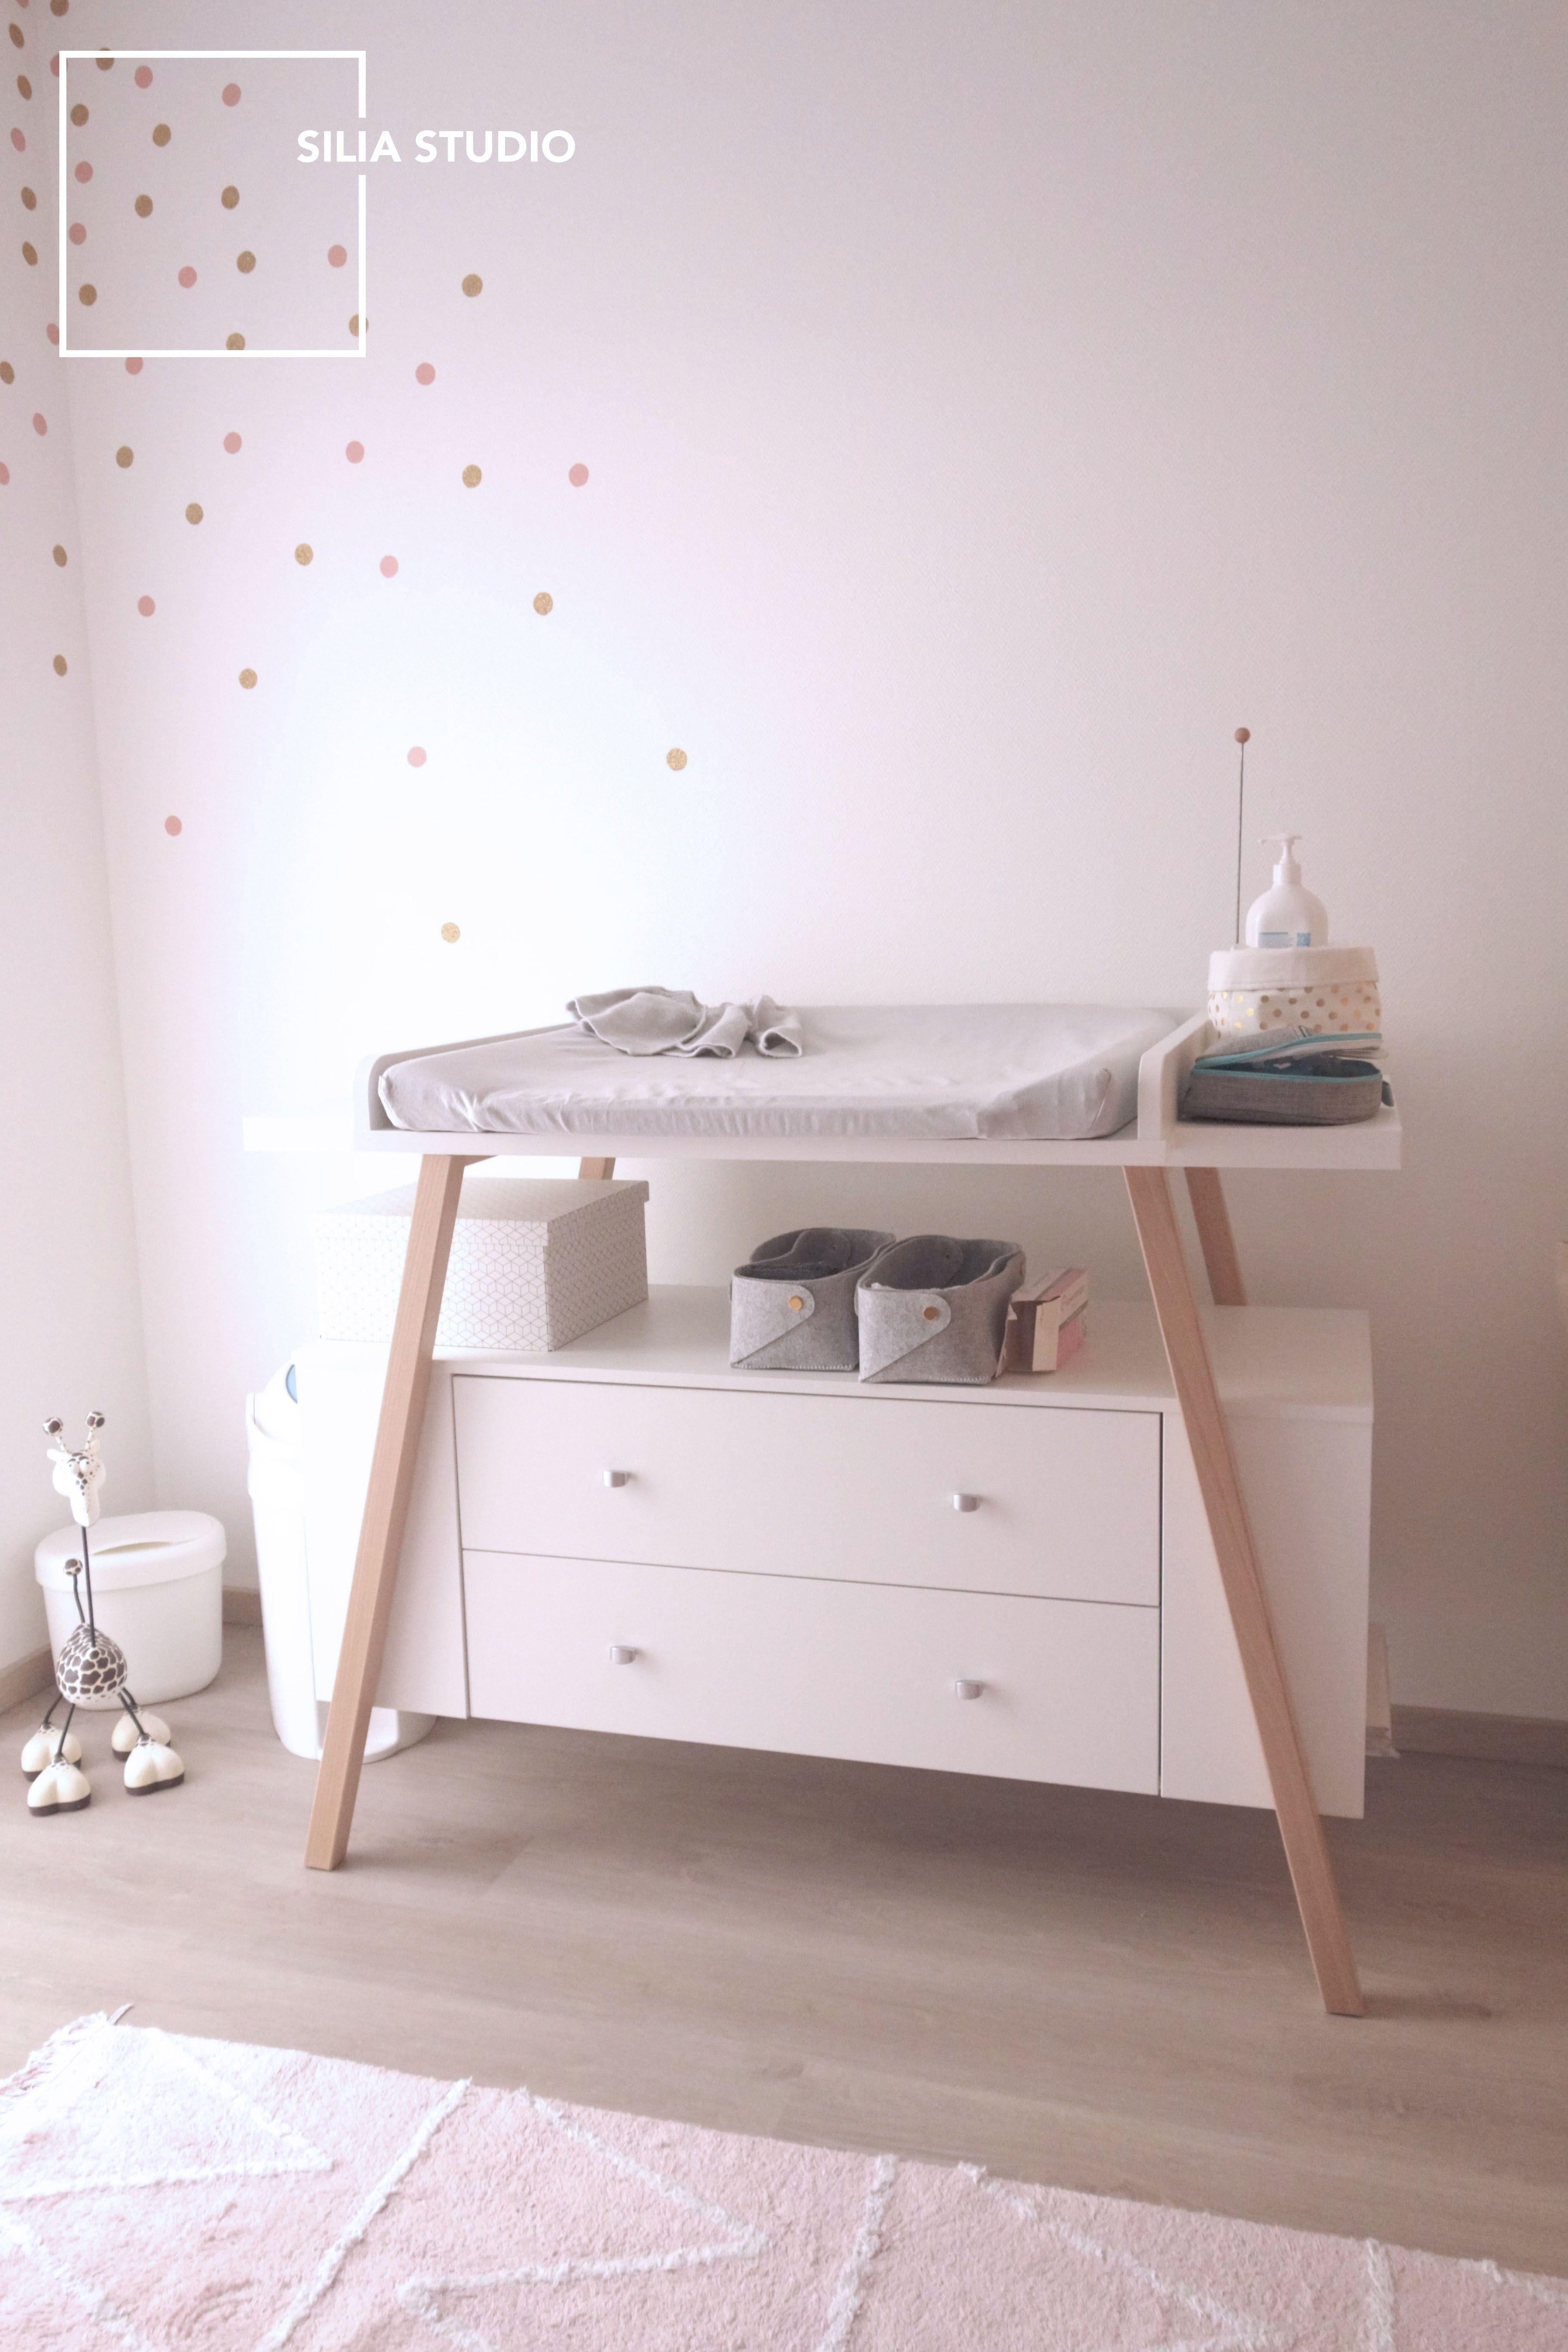 table a langer scandinave chambre bebe commode babyzimmer dekor wickeltisch skandinavisches babyzimmer